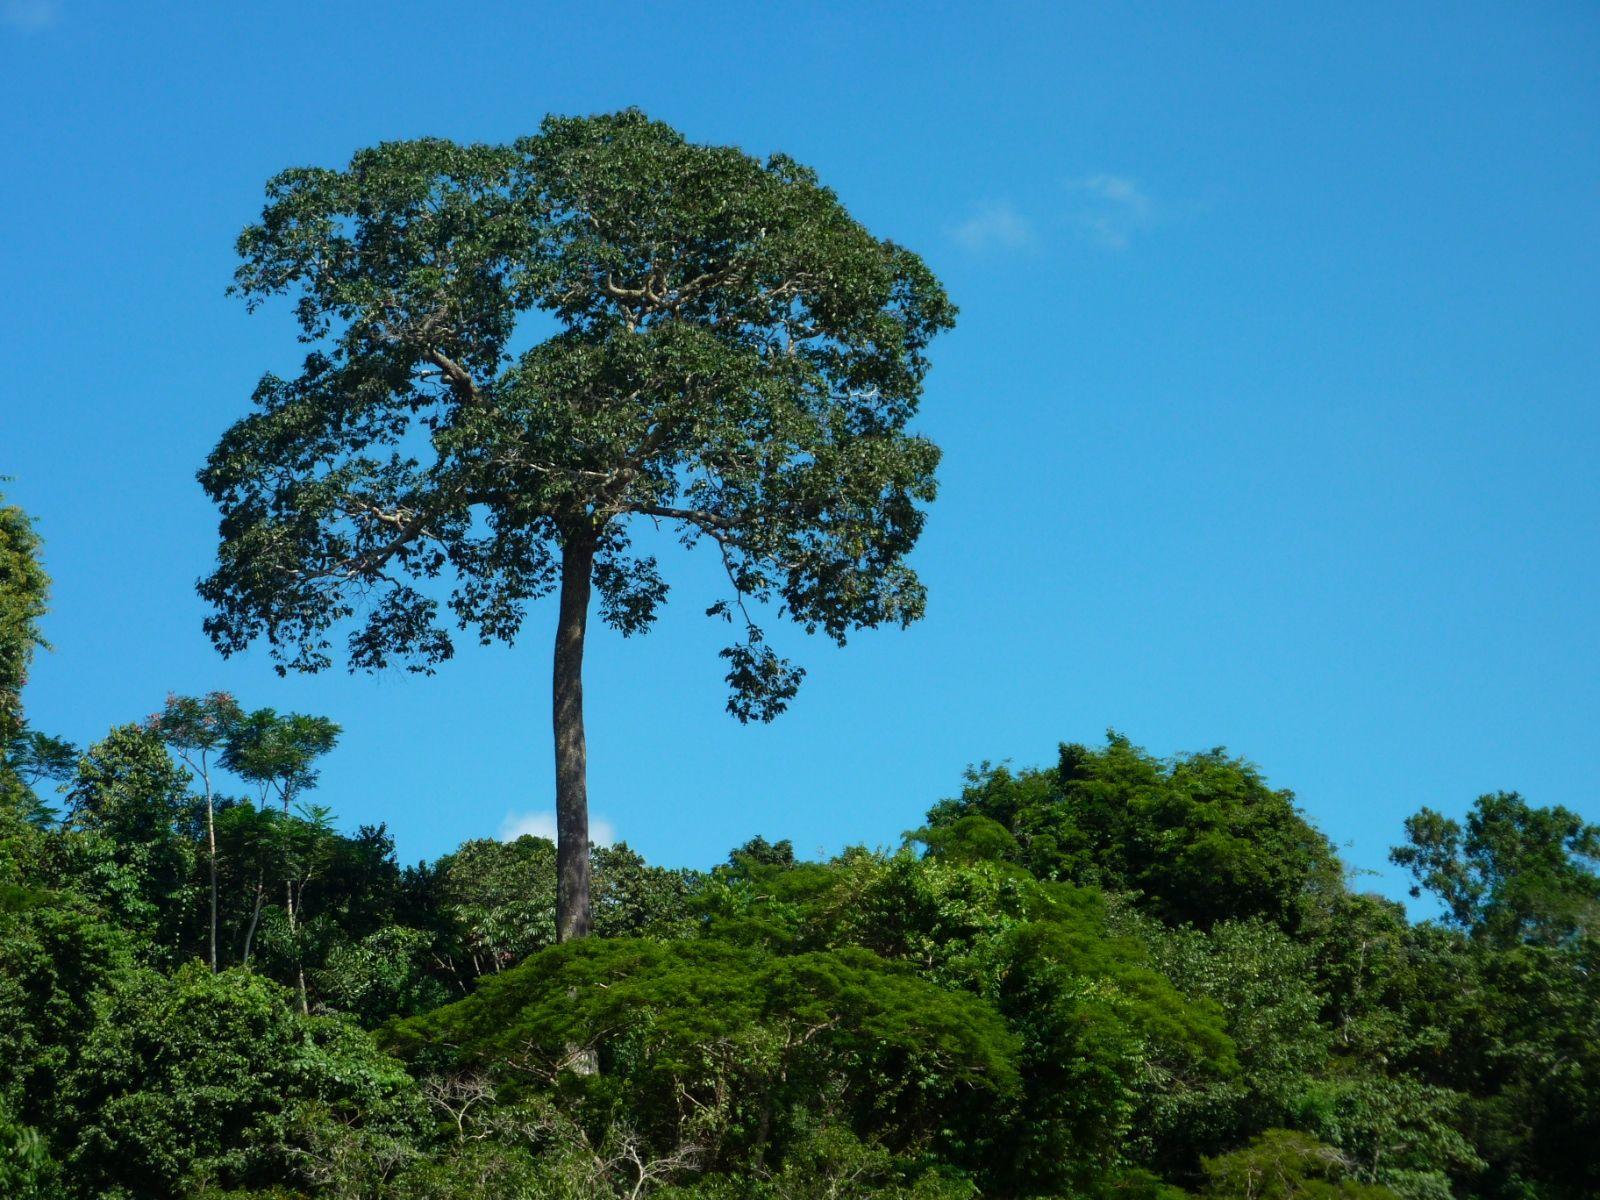 Emergent Layer Brazil Nut Tree